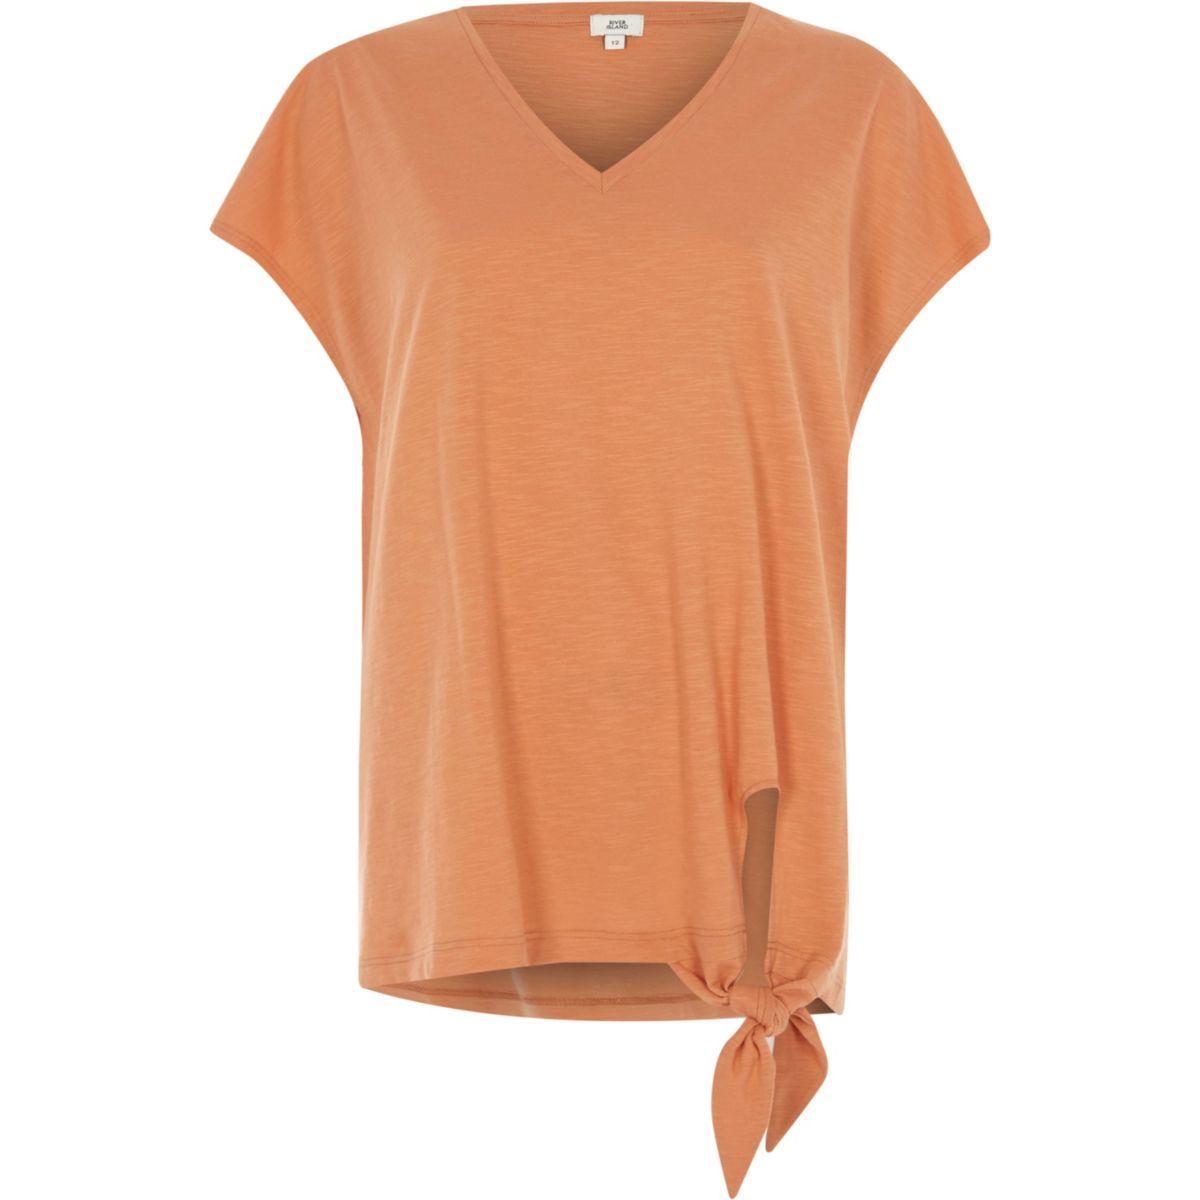 099829c7f12888 Orange V neck knot front T-shirt - Plain T-Shirts   Vests -